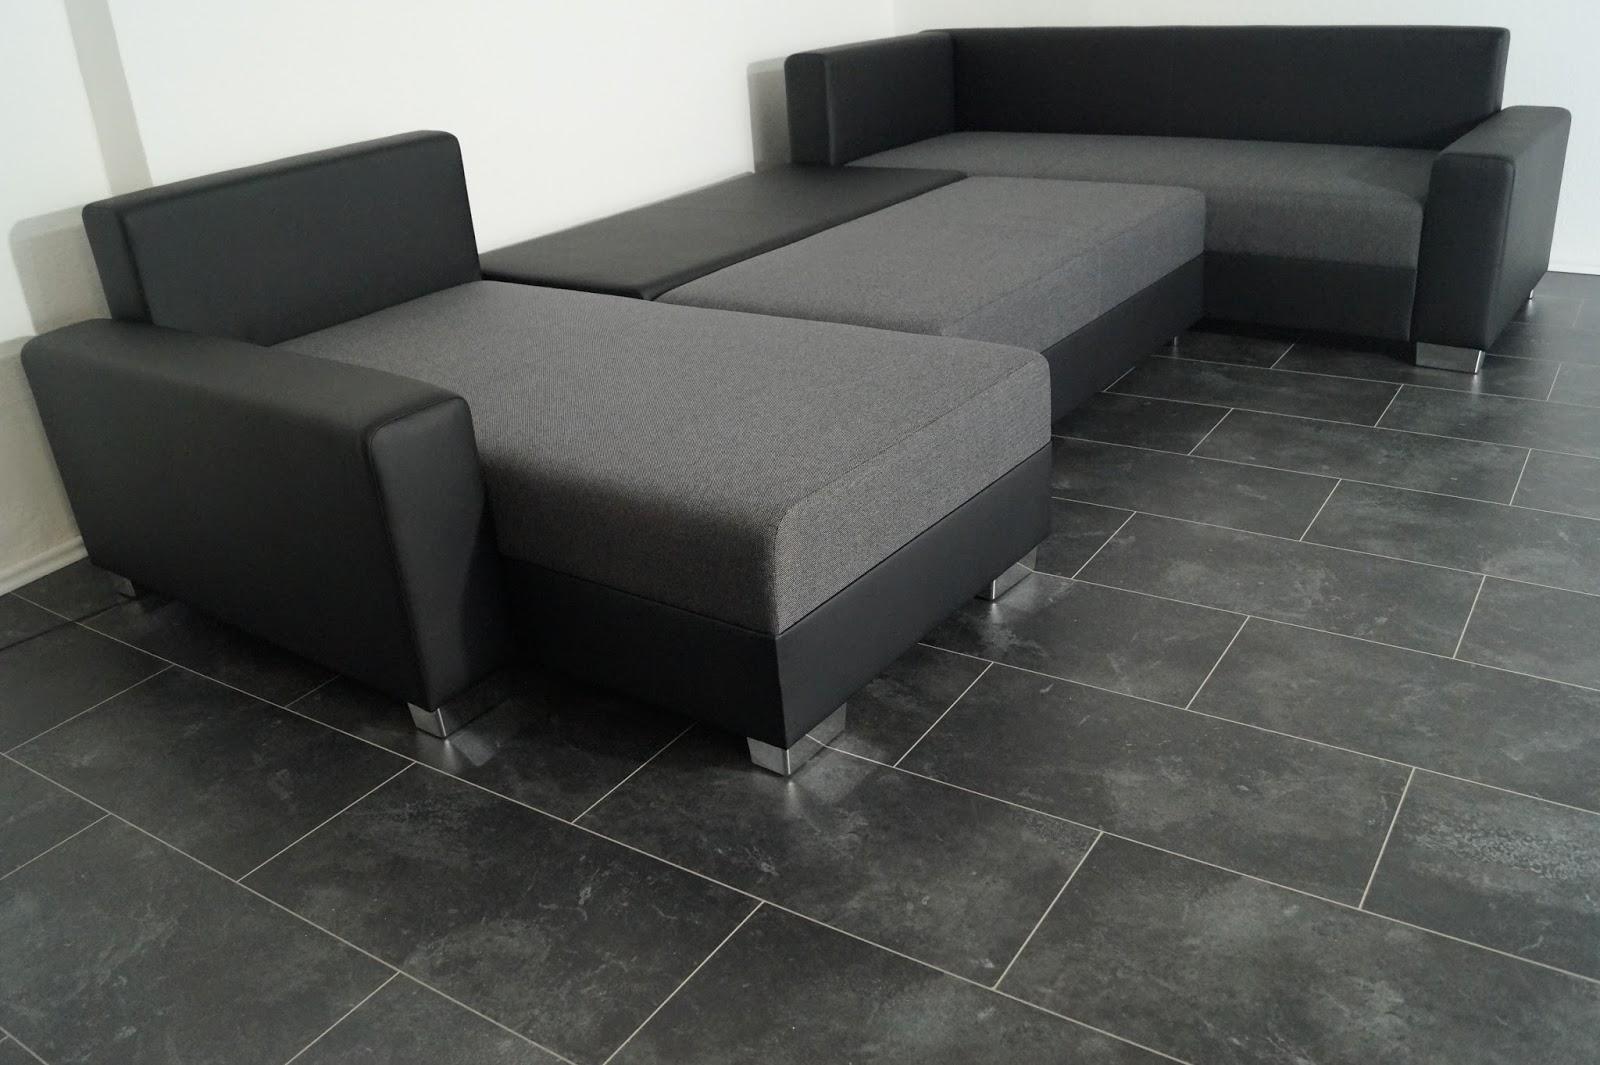 u sofa bettsofa wohnlandschaft 330 cm breit stellma e. Black Bedroom Furniture Sets. Home Design Ideas